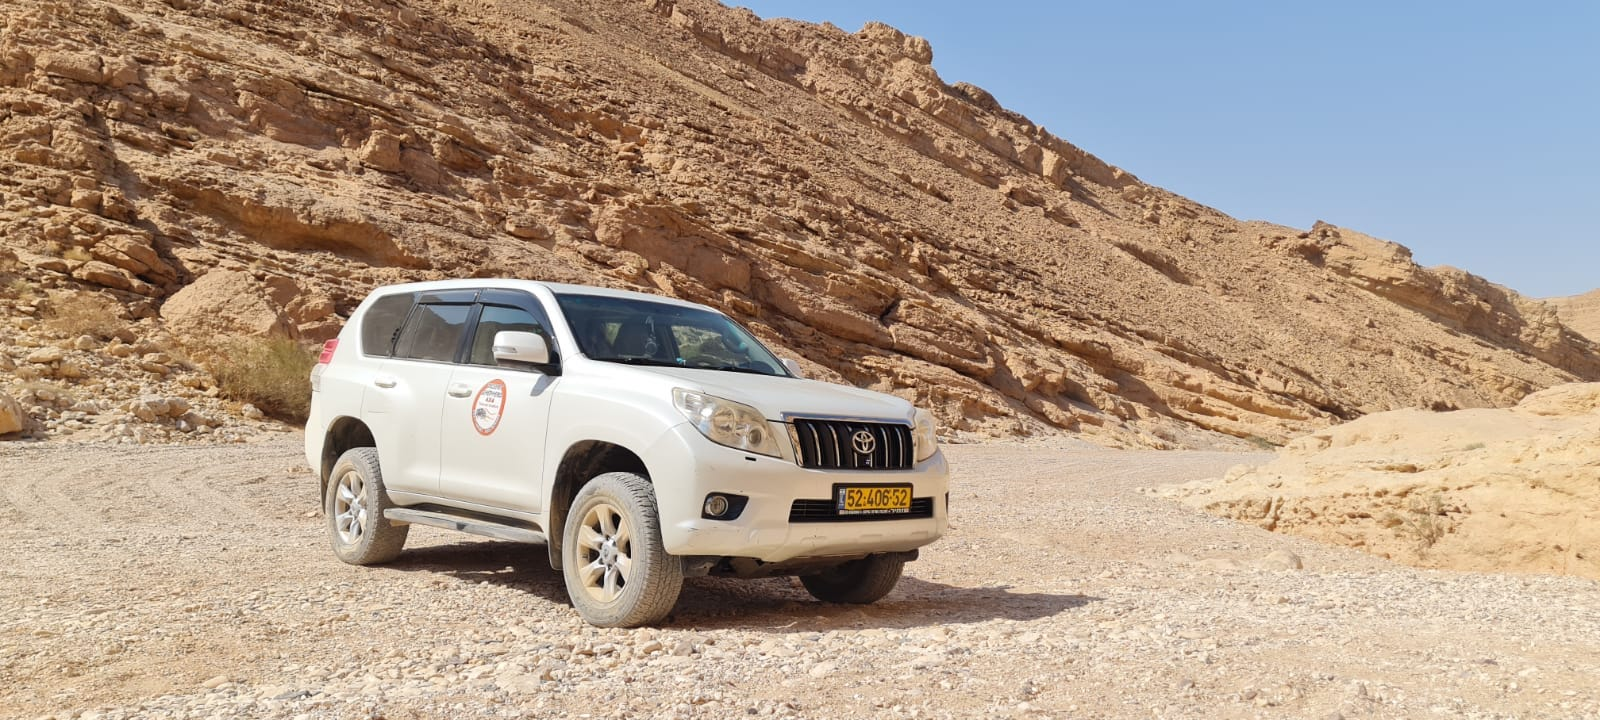 Negev Desert Jeep Tours & Safaris_4